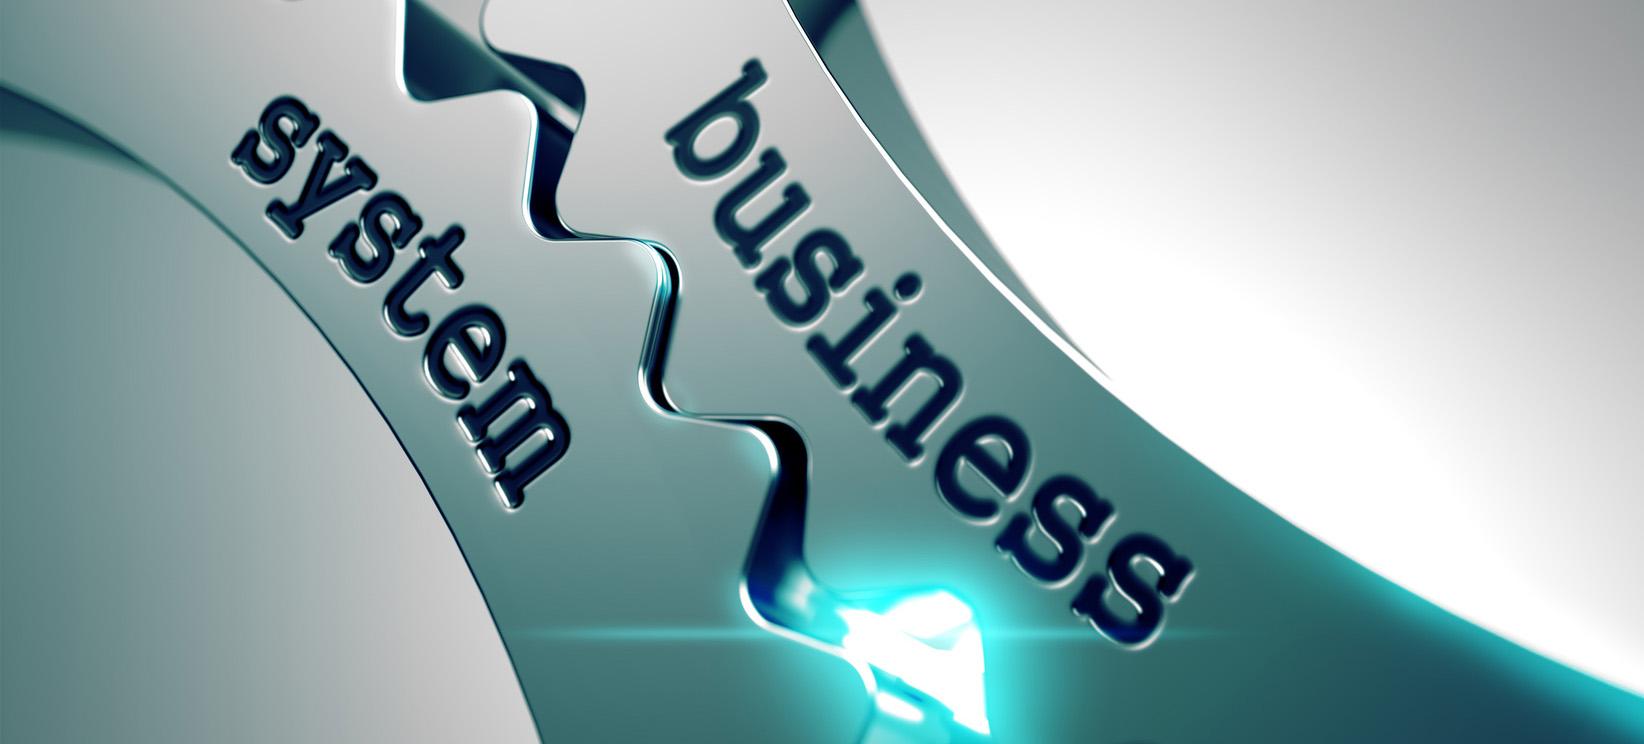 Business System Analysis - Riyadh